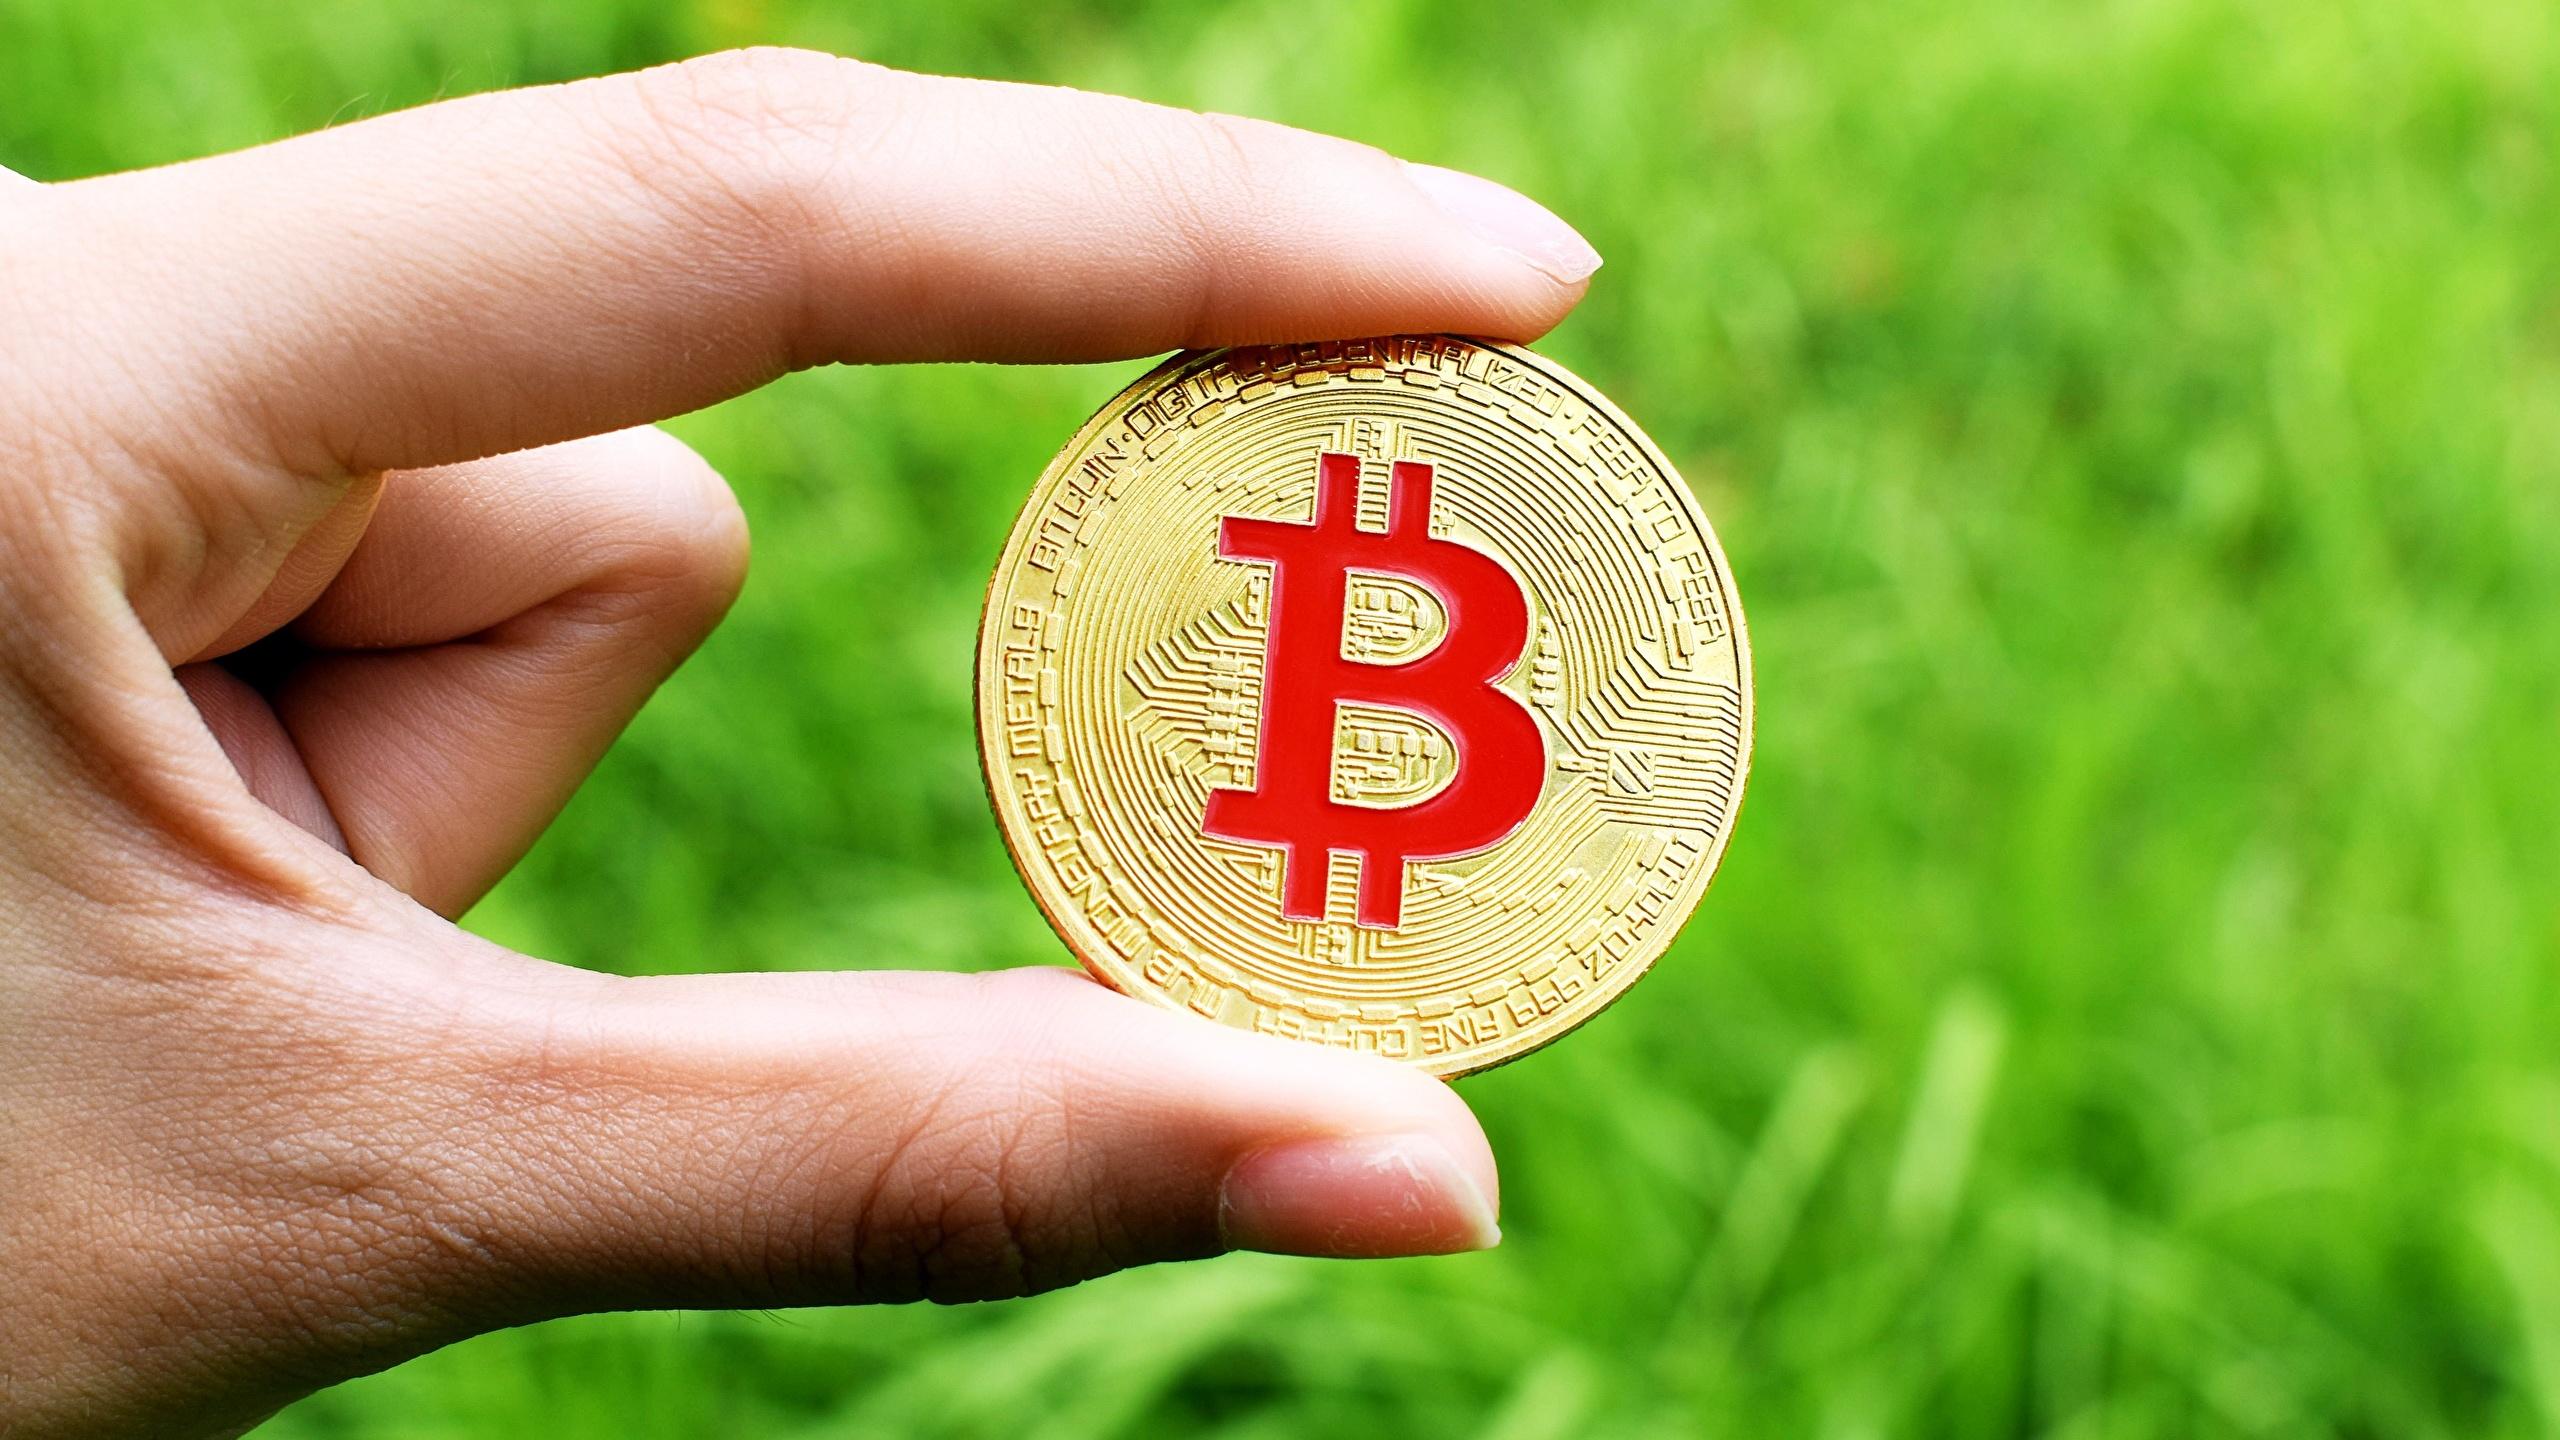 Desktop Wallpapers Coins Bitcoin Gold color Money Fingers 2560x1440